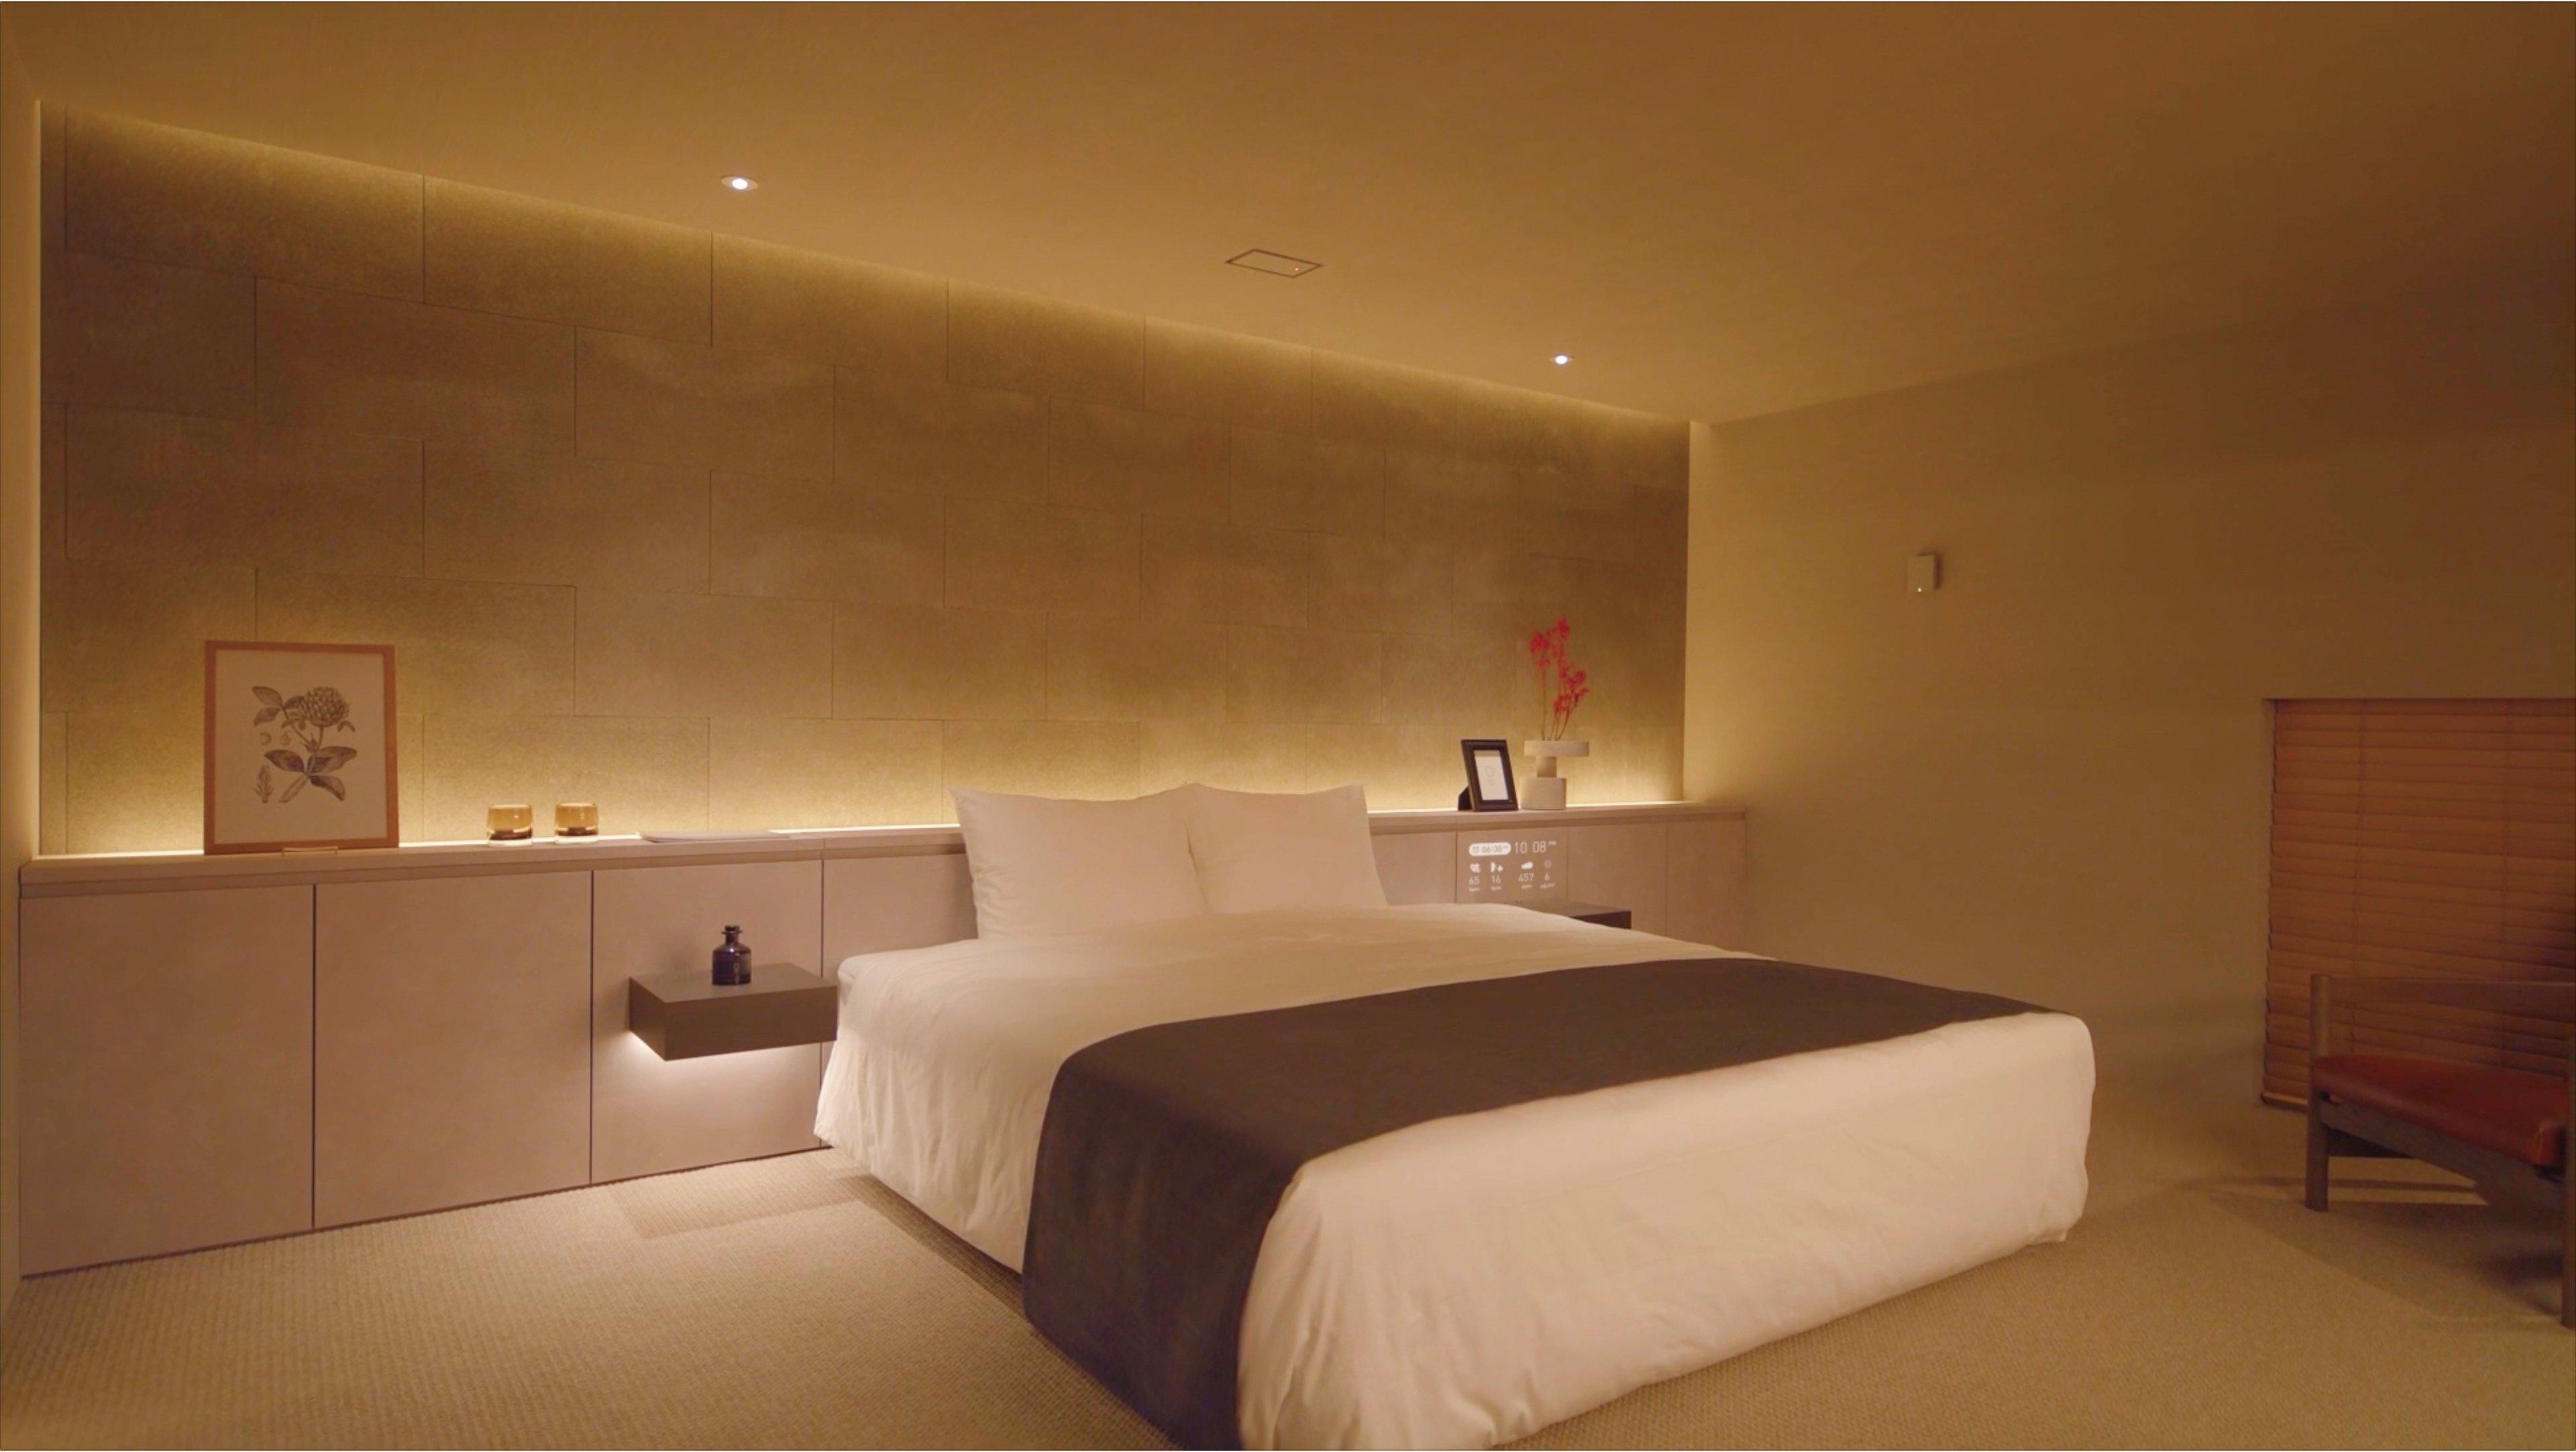 Photo: A smart bedroom that promote comfortable sleep